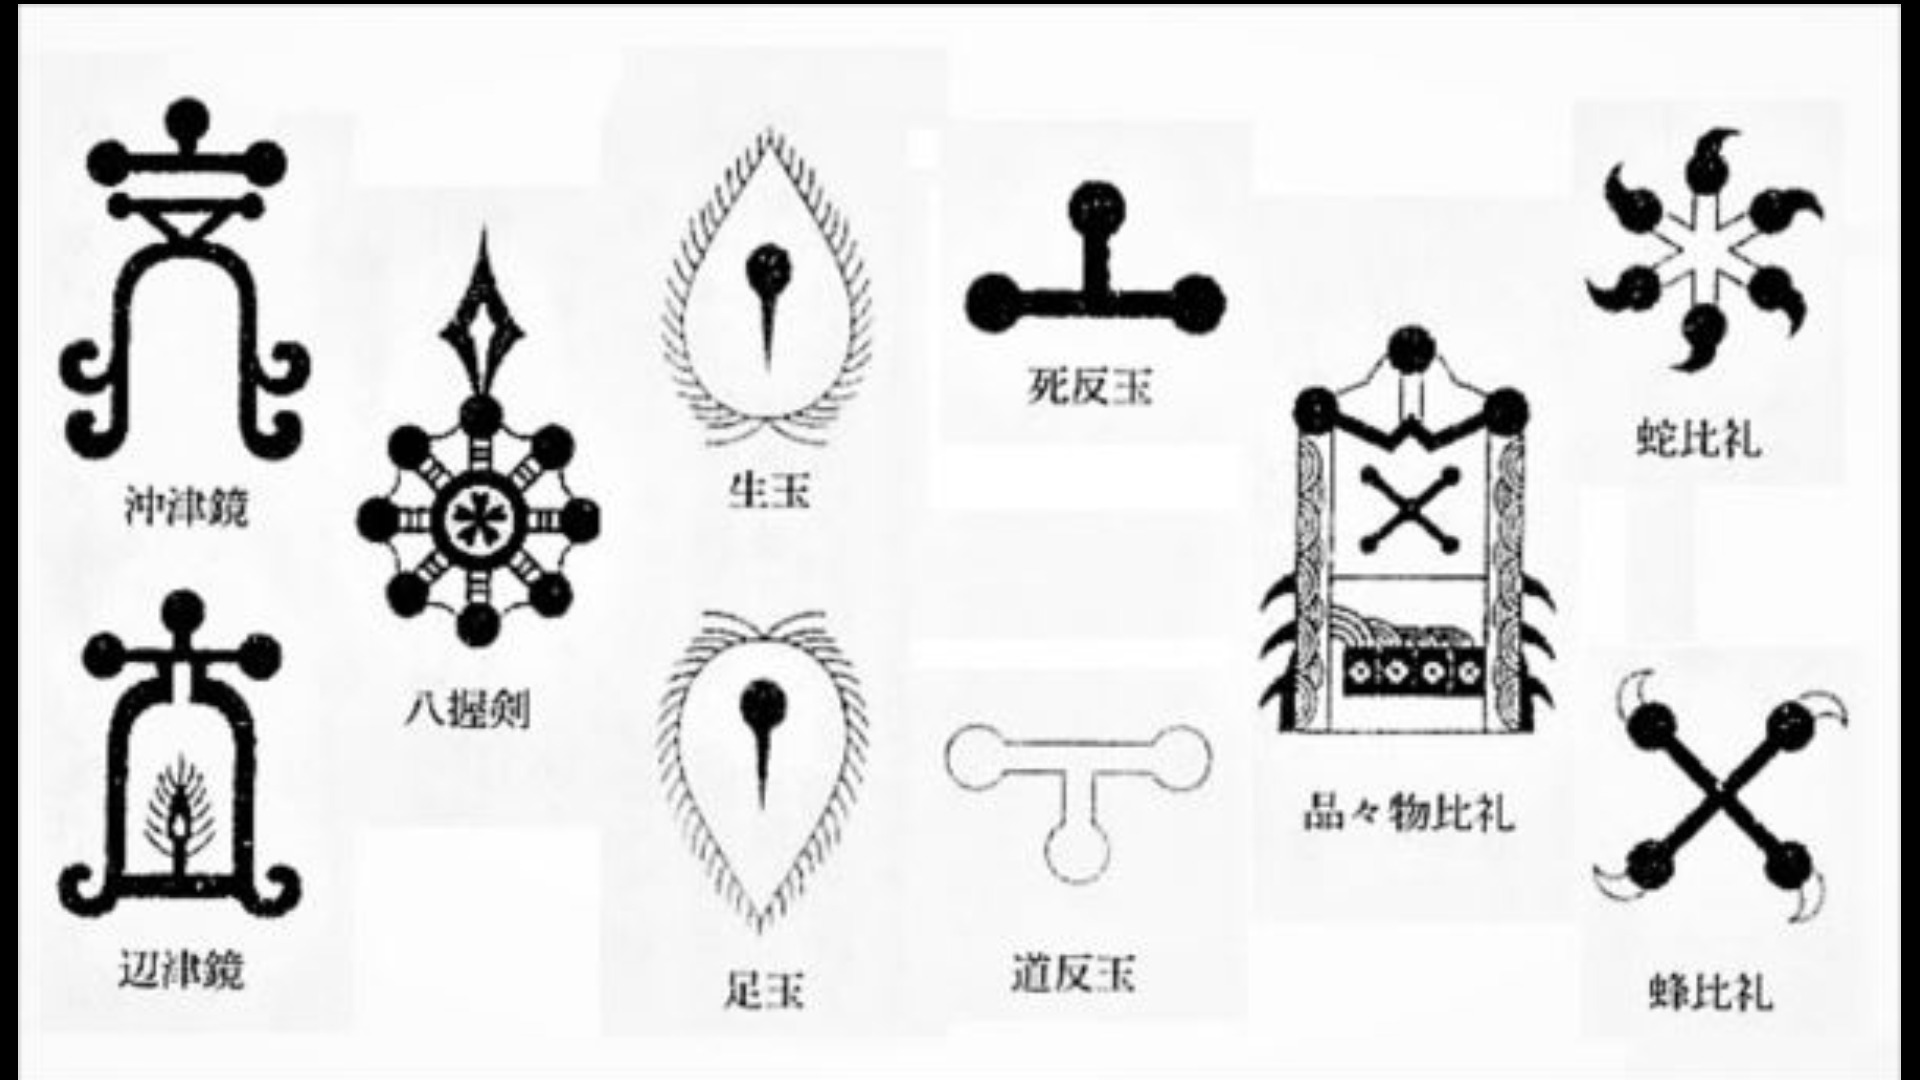 21.4.27【呪術編】第2回 呪咀